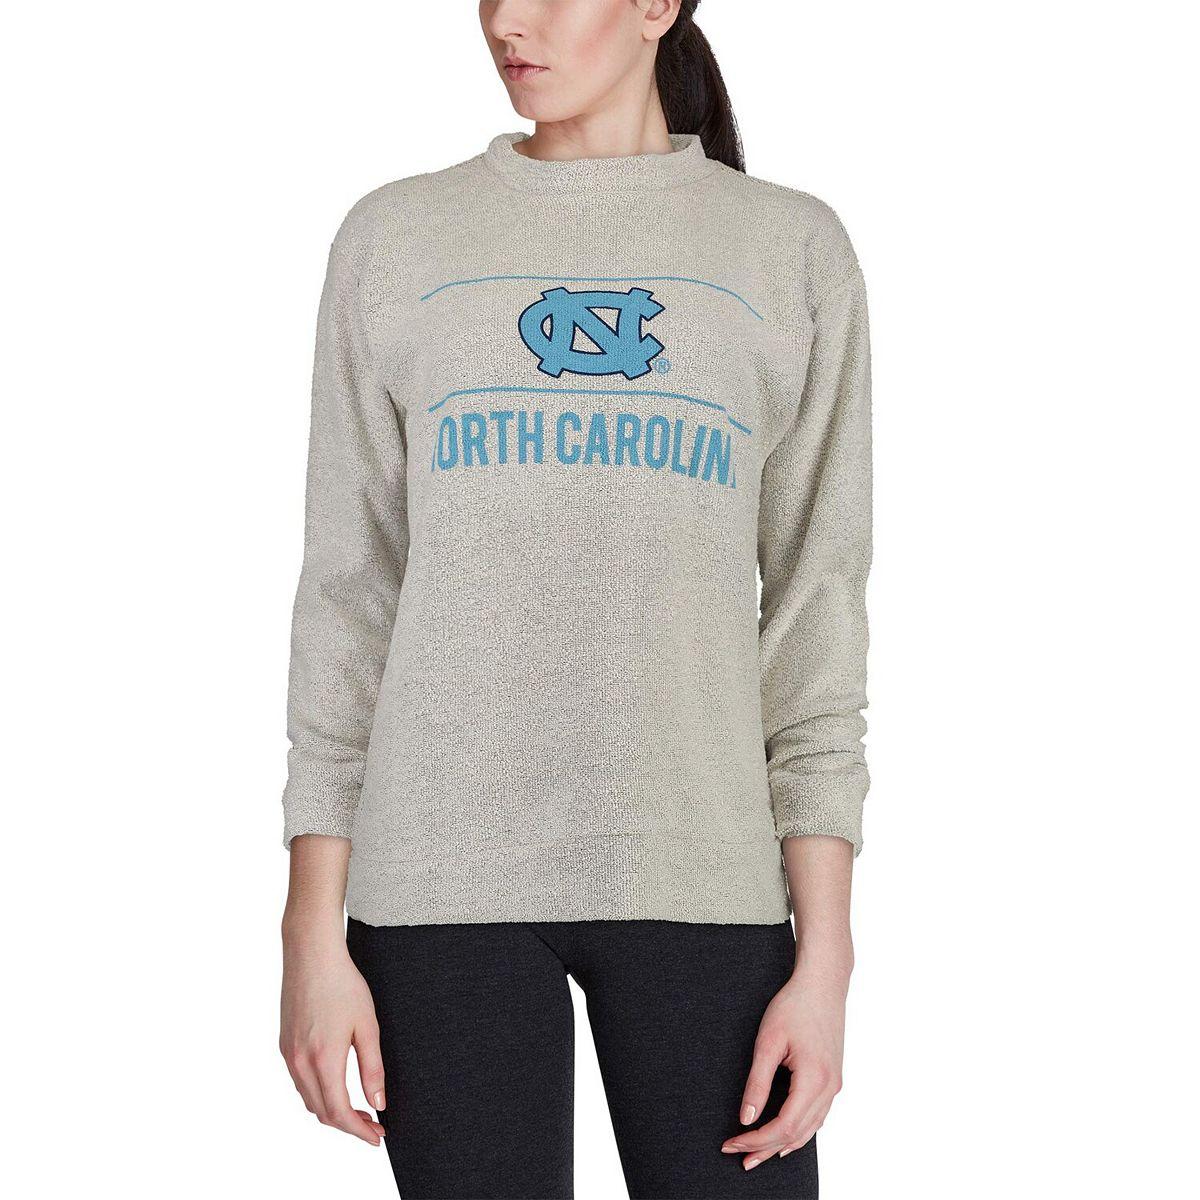 Women's Woolly Threads Natural North Carolina Tar Heels Original Woolly Pullover Sweatshirt cdoWt